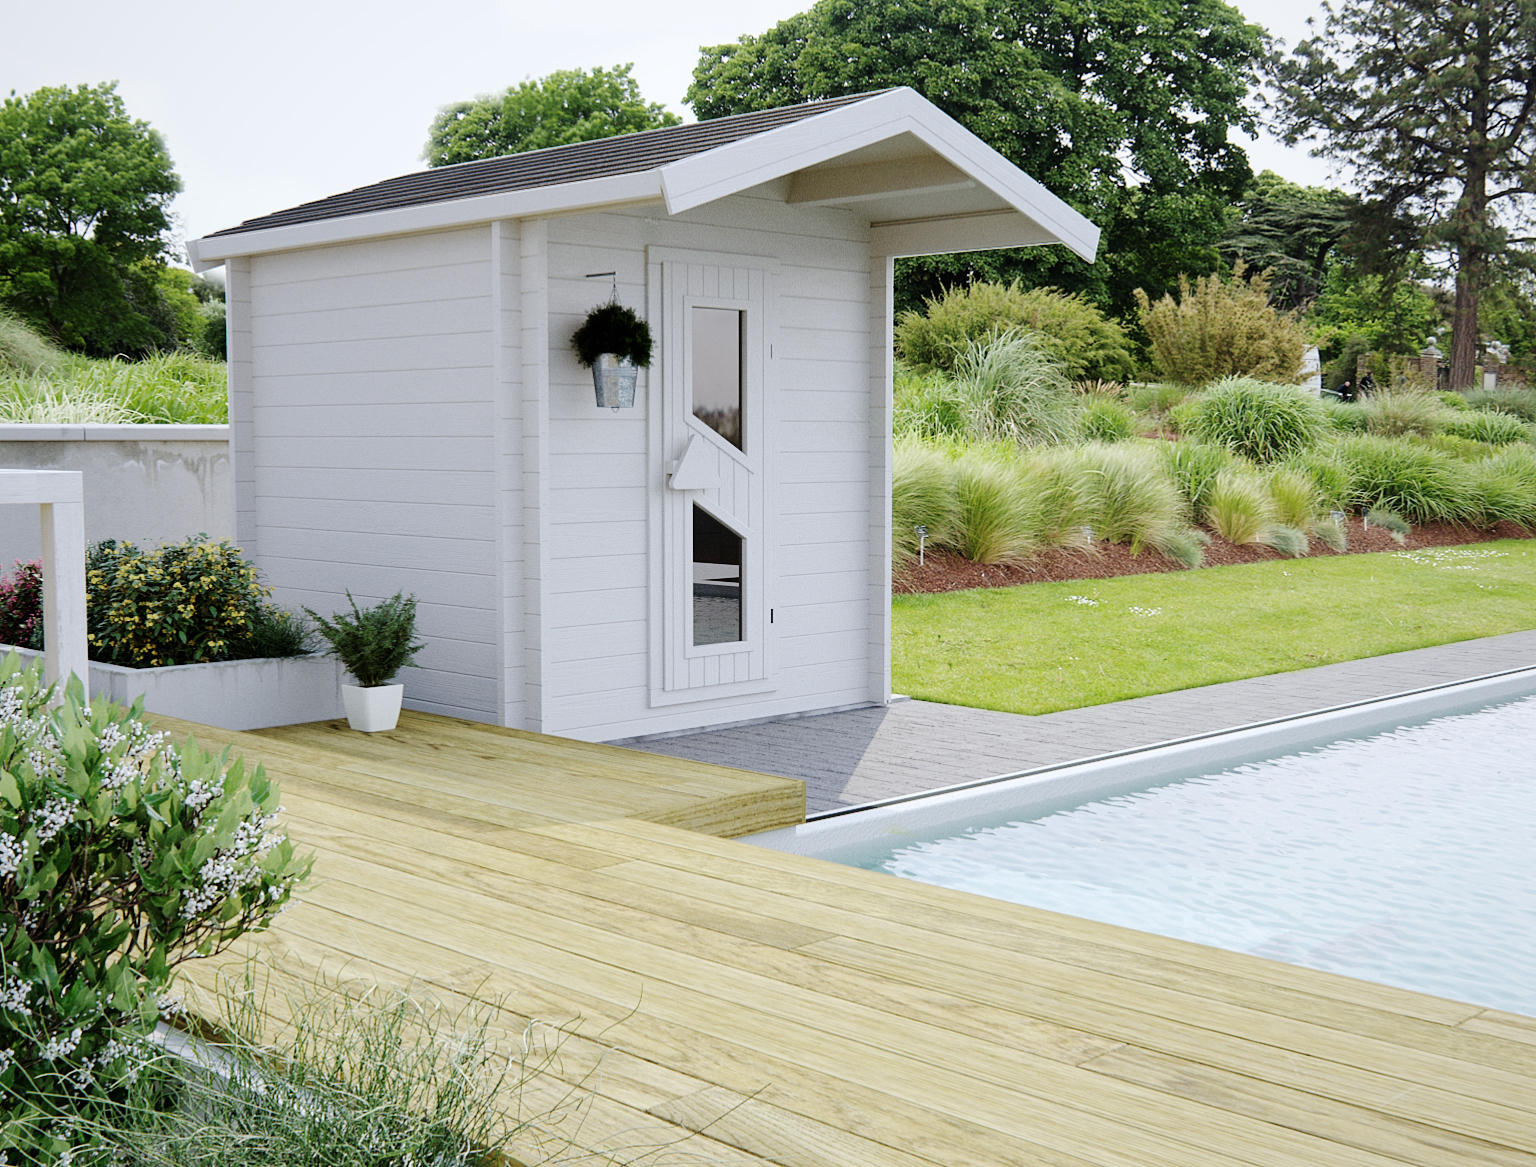 BIOLA 45 mm 1,95 m x 1,95 m Biancasa sauna Finlandais